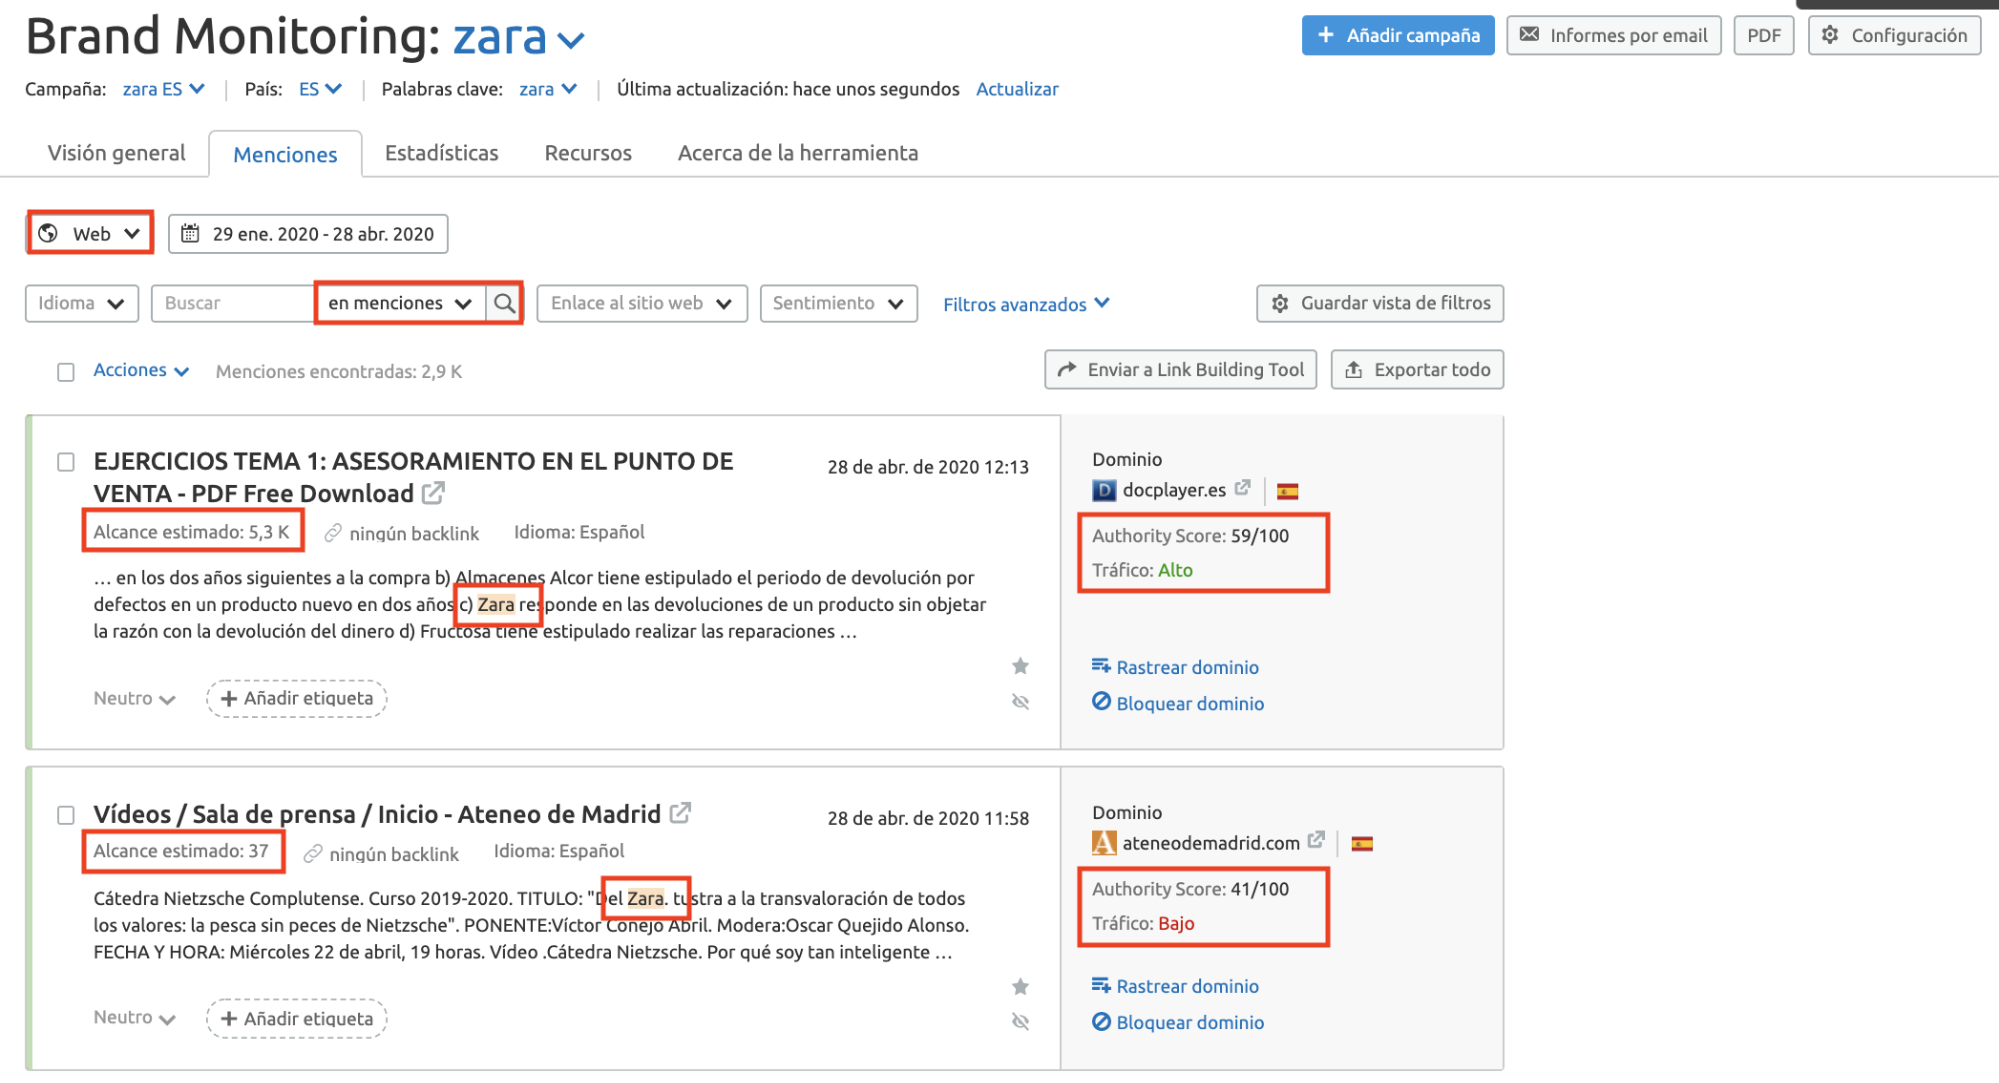 Estudio de la competencia - Brand monitoring Zara